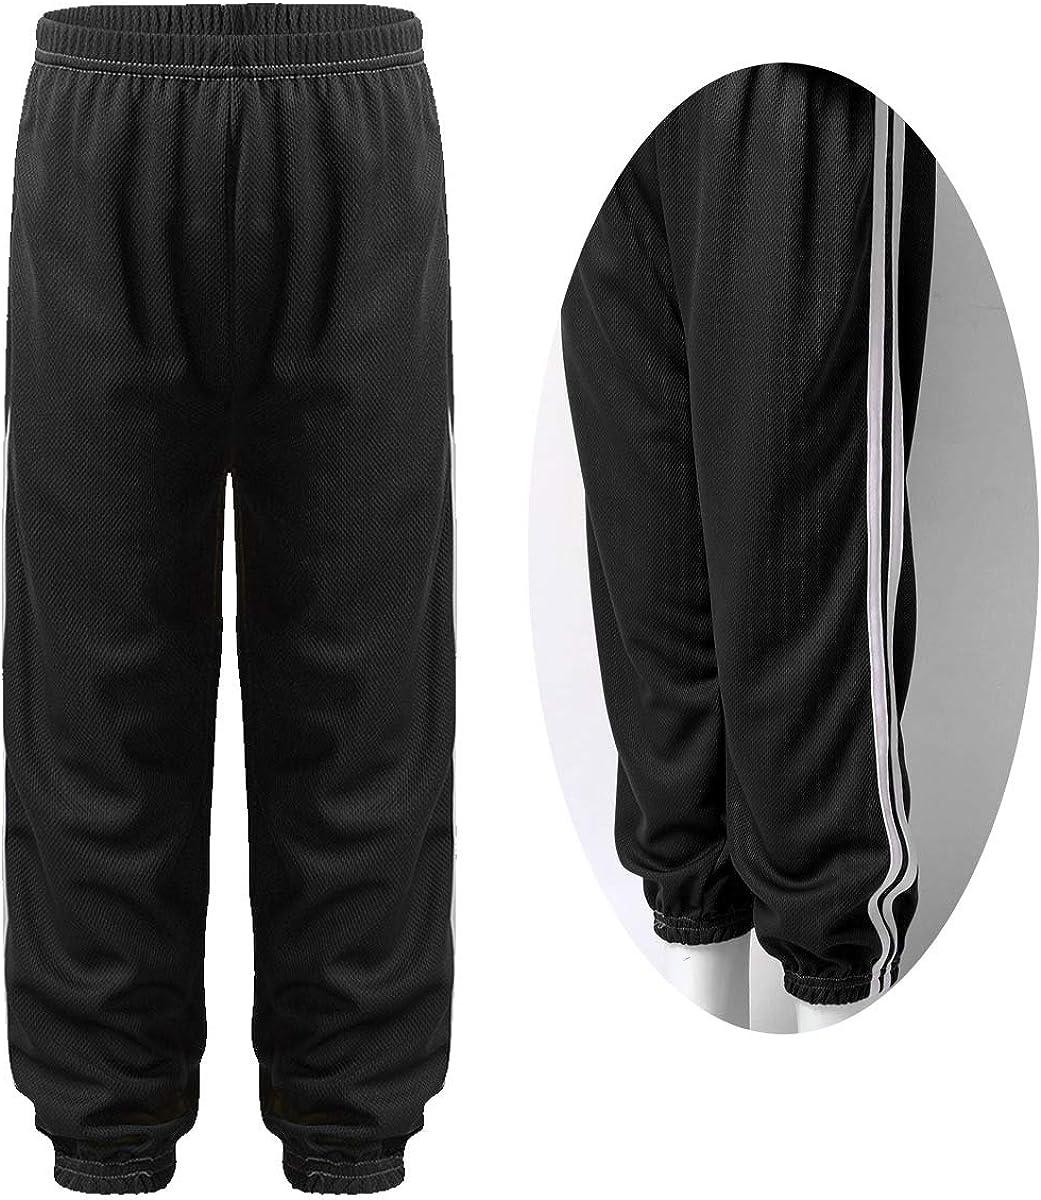 FEESHOW Kids Girls Workout Jogger Pants Sports Dance wear Loose Casual Harem Pants Trousers Sweatpants